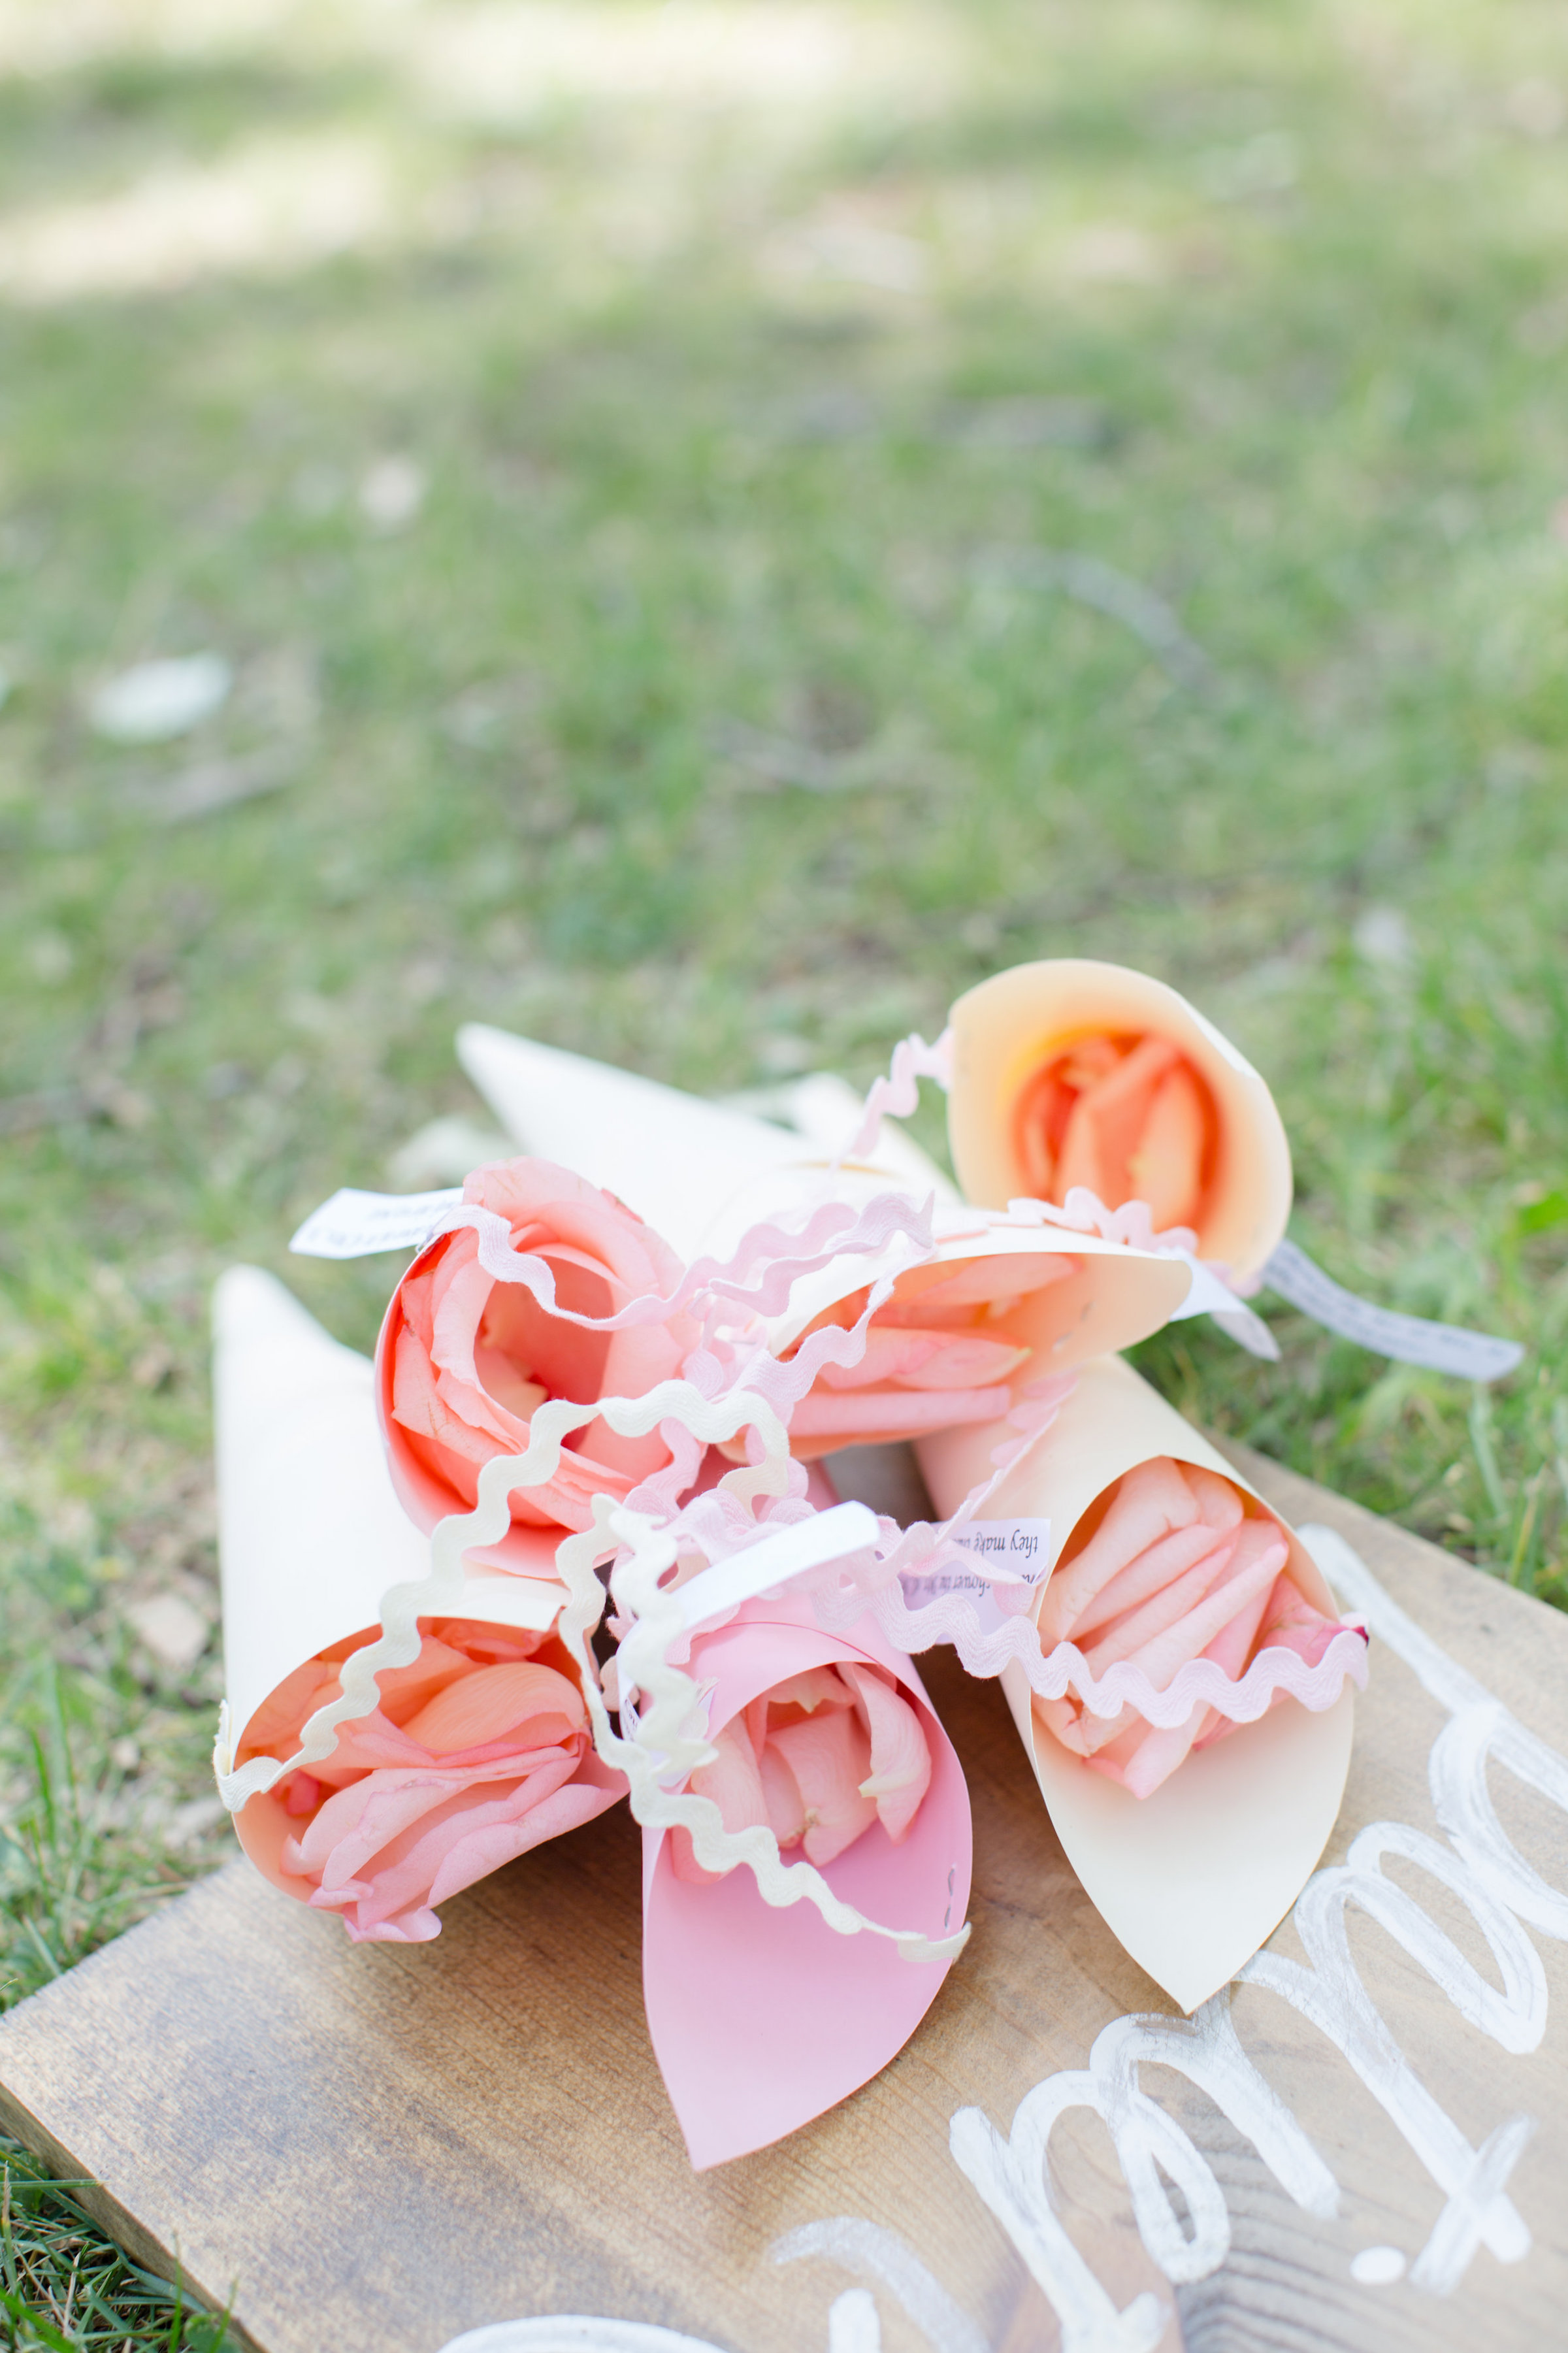 Bethy and Max w gallery-03 rosepetals web.jpg